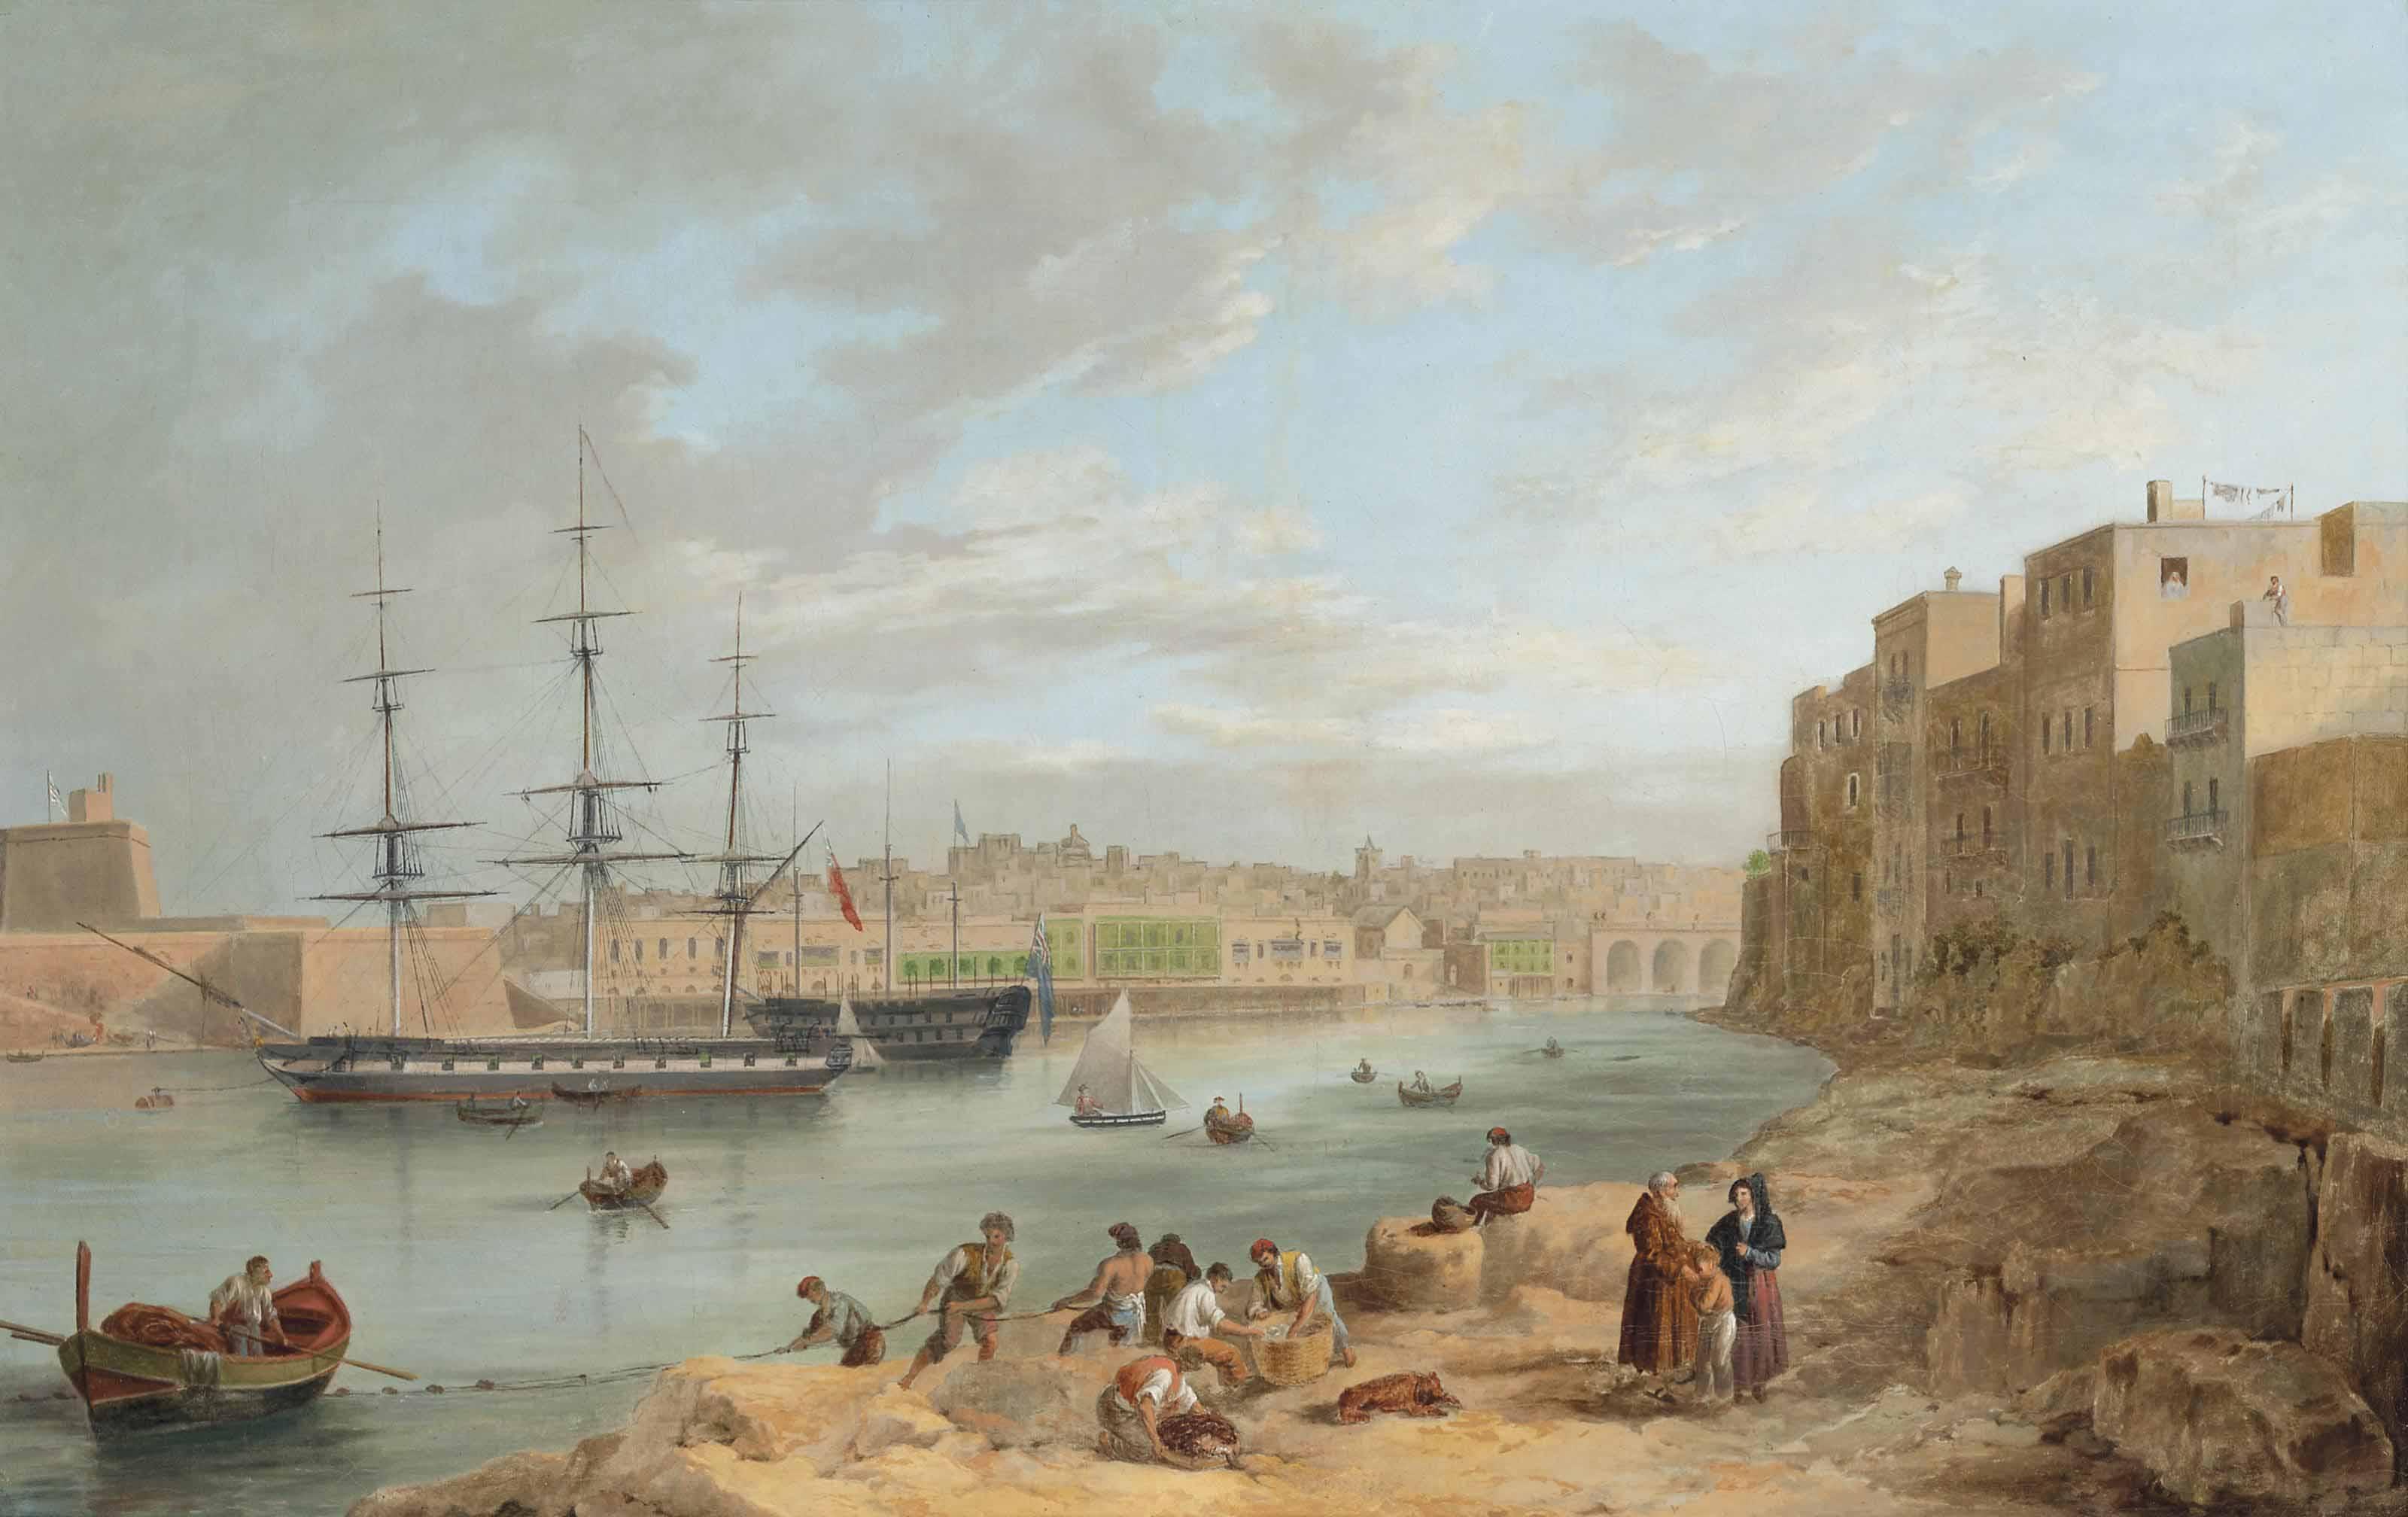 H.M.S. Champion moored off Fort St Angelo, Valetta, Malta